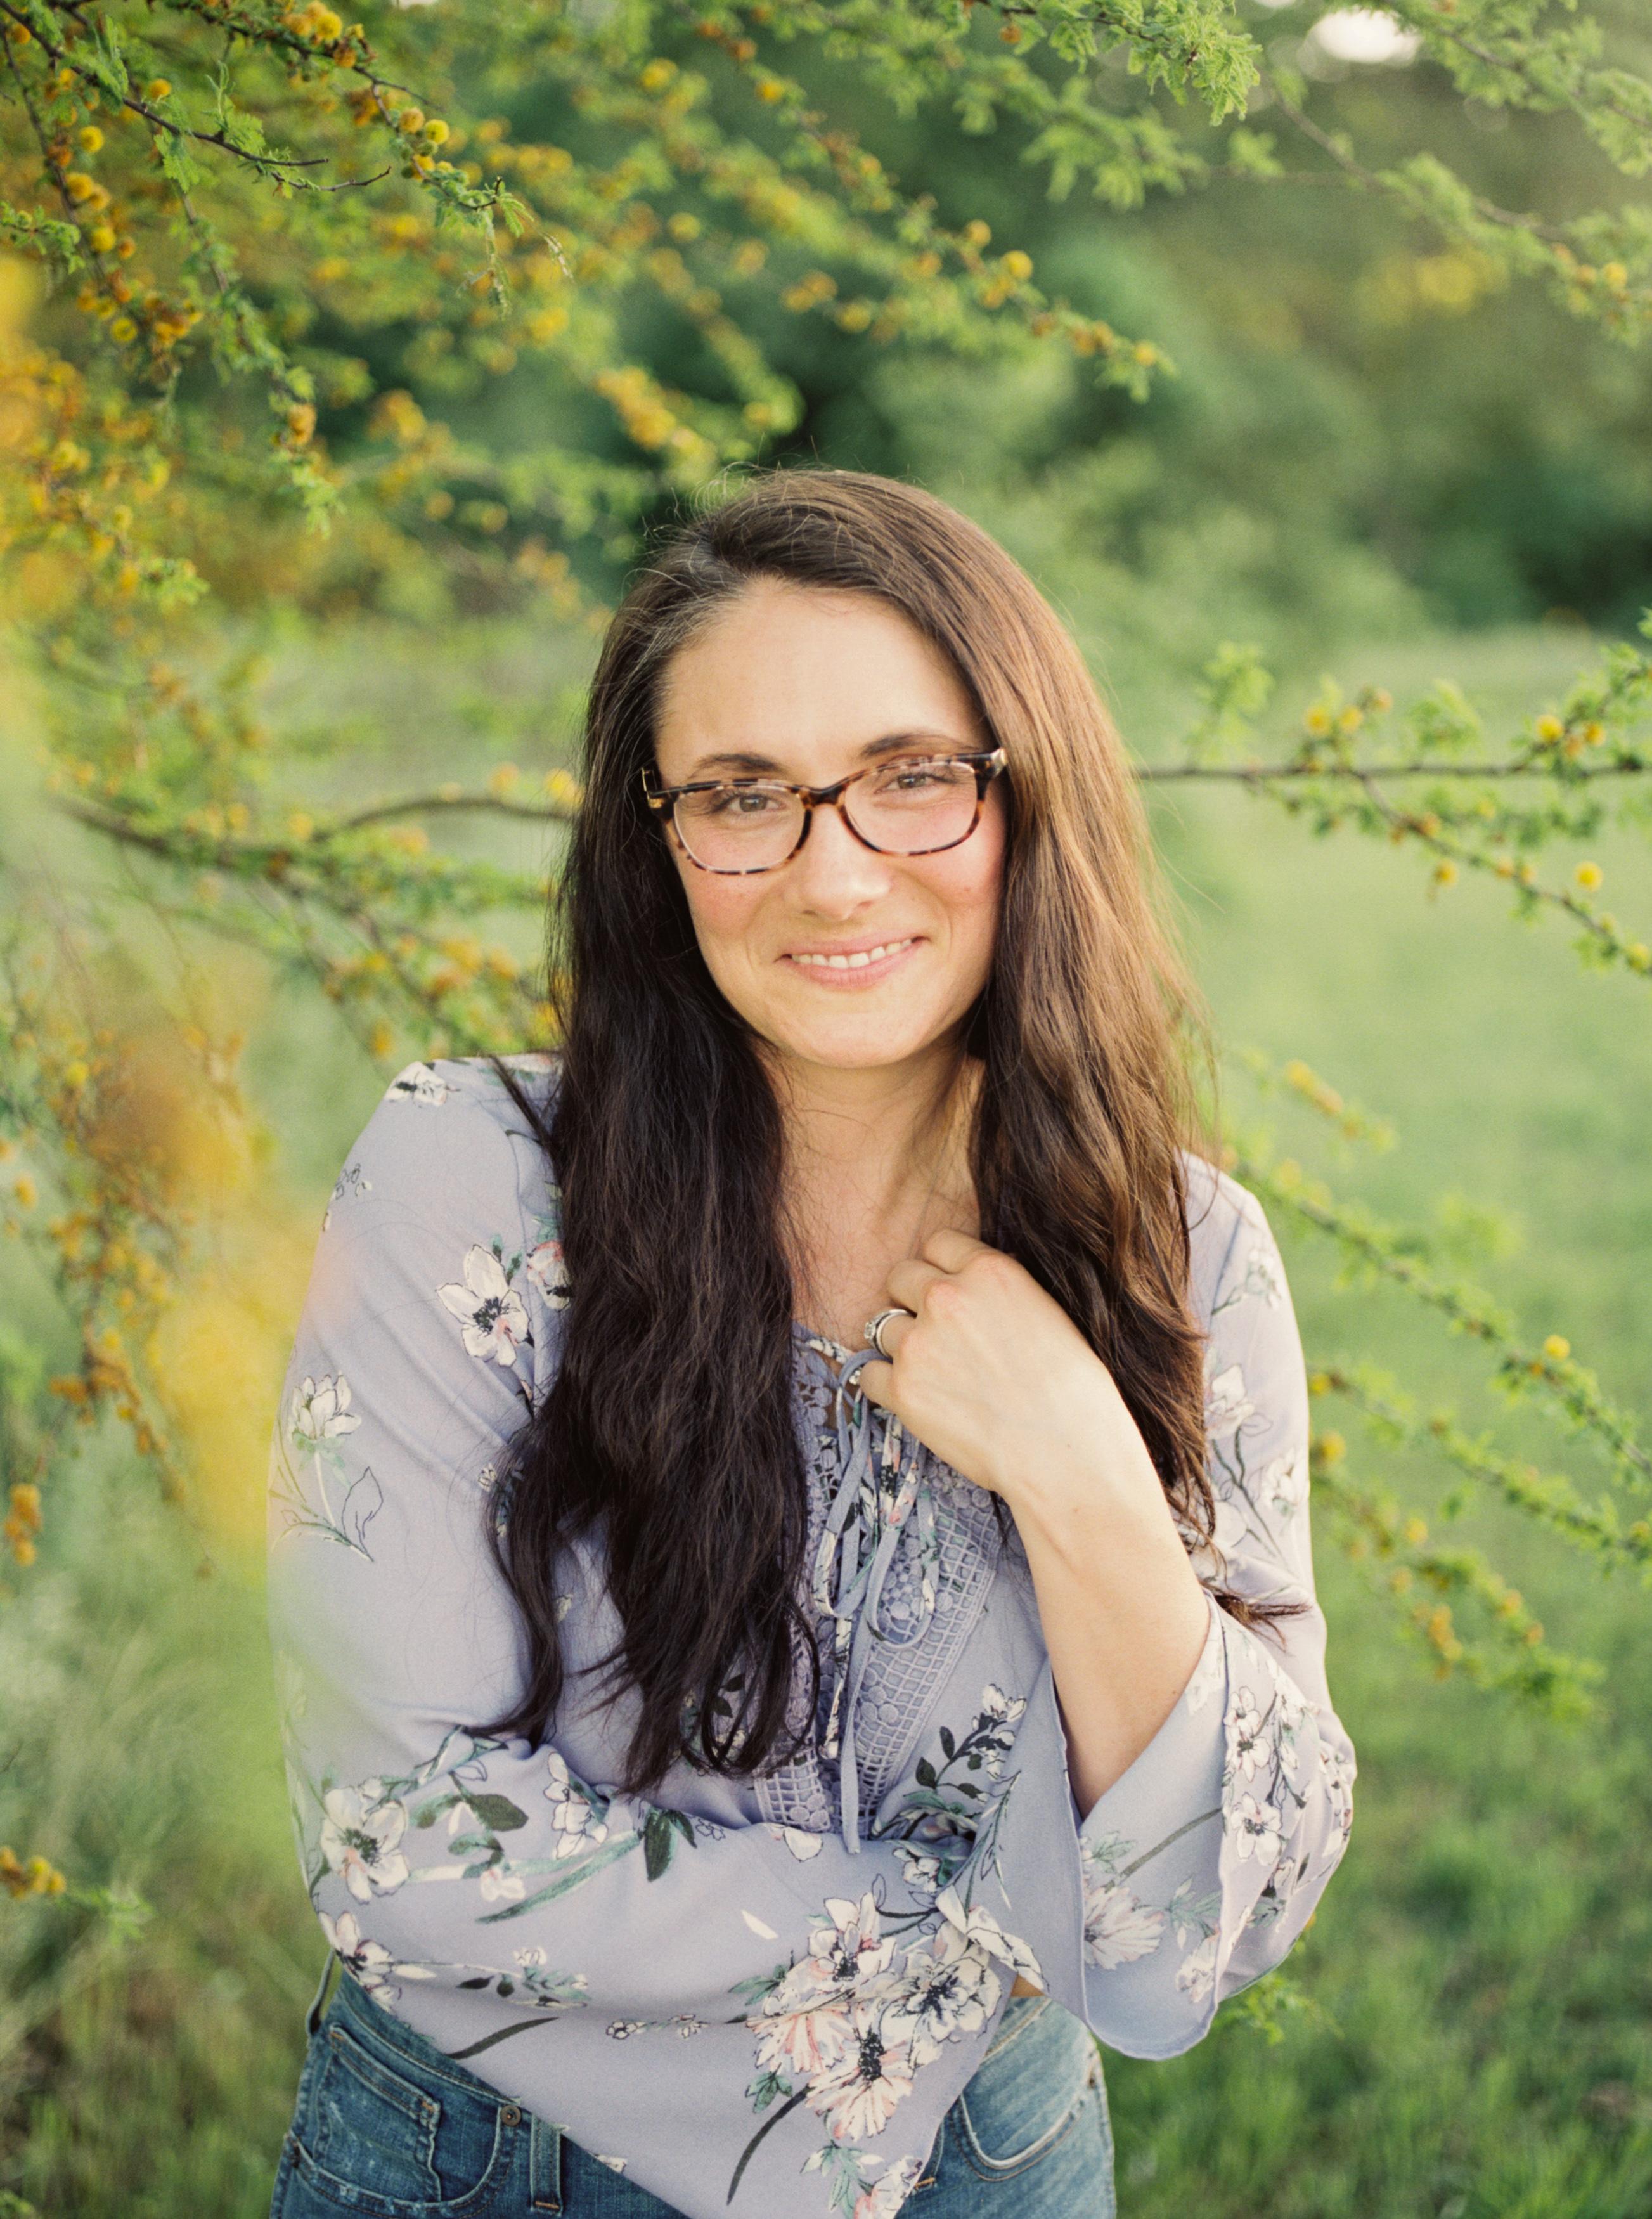 Jen Brazeal | Photographer and mastermind behind the Photo Organization